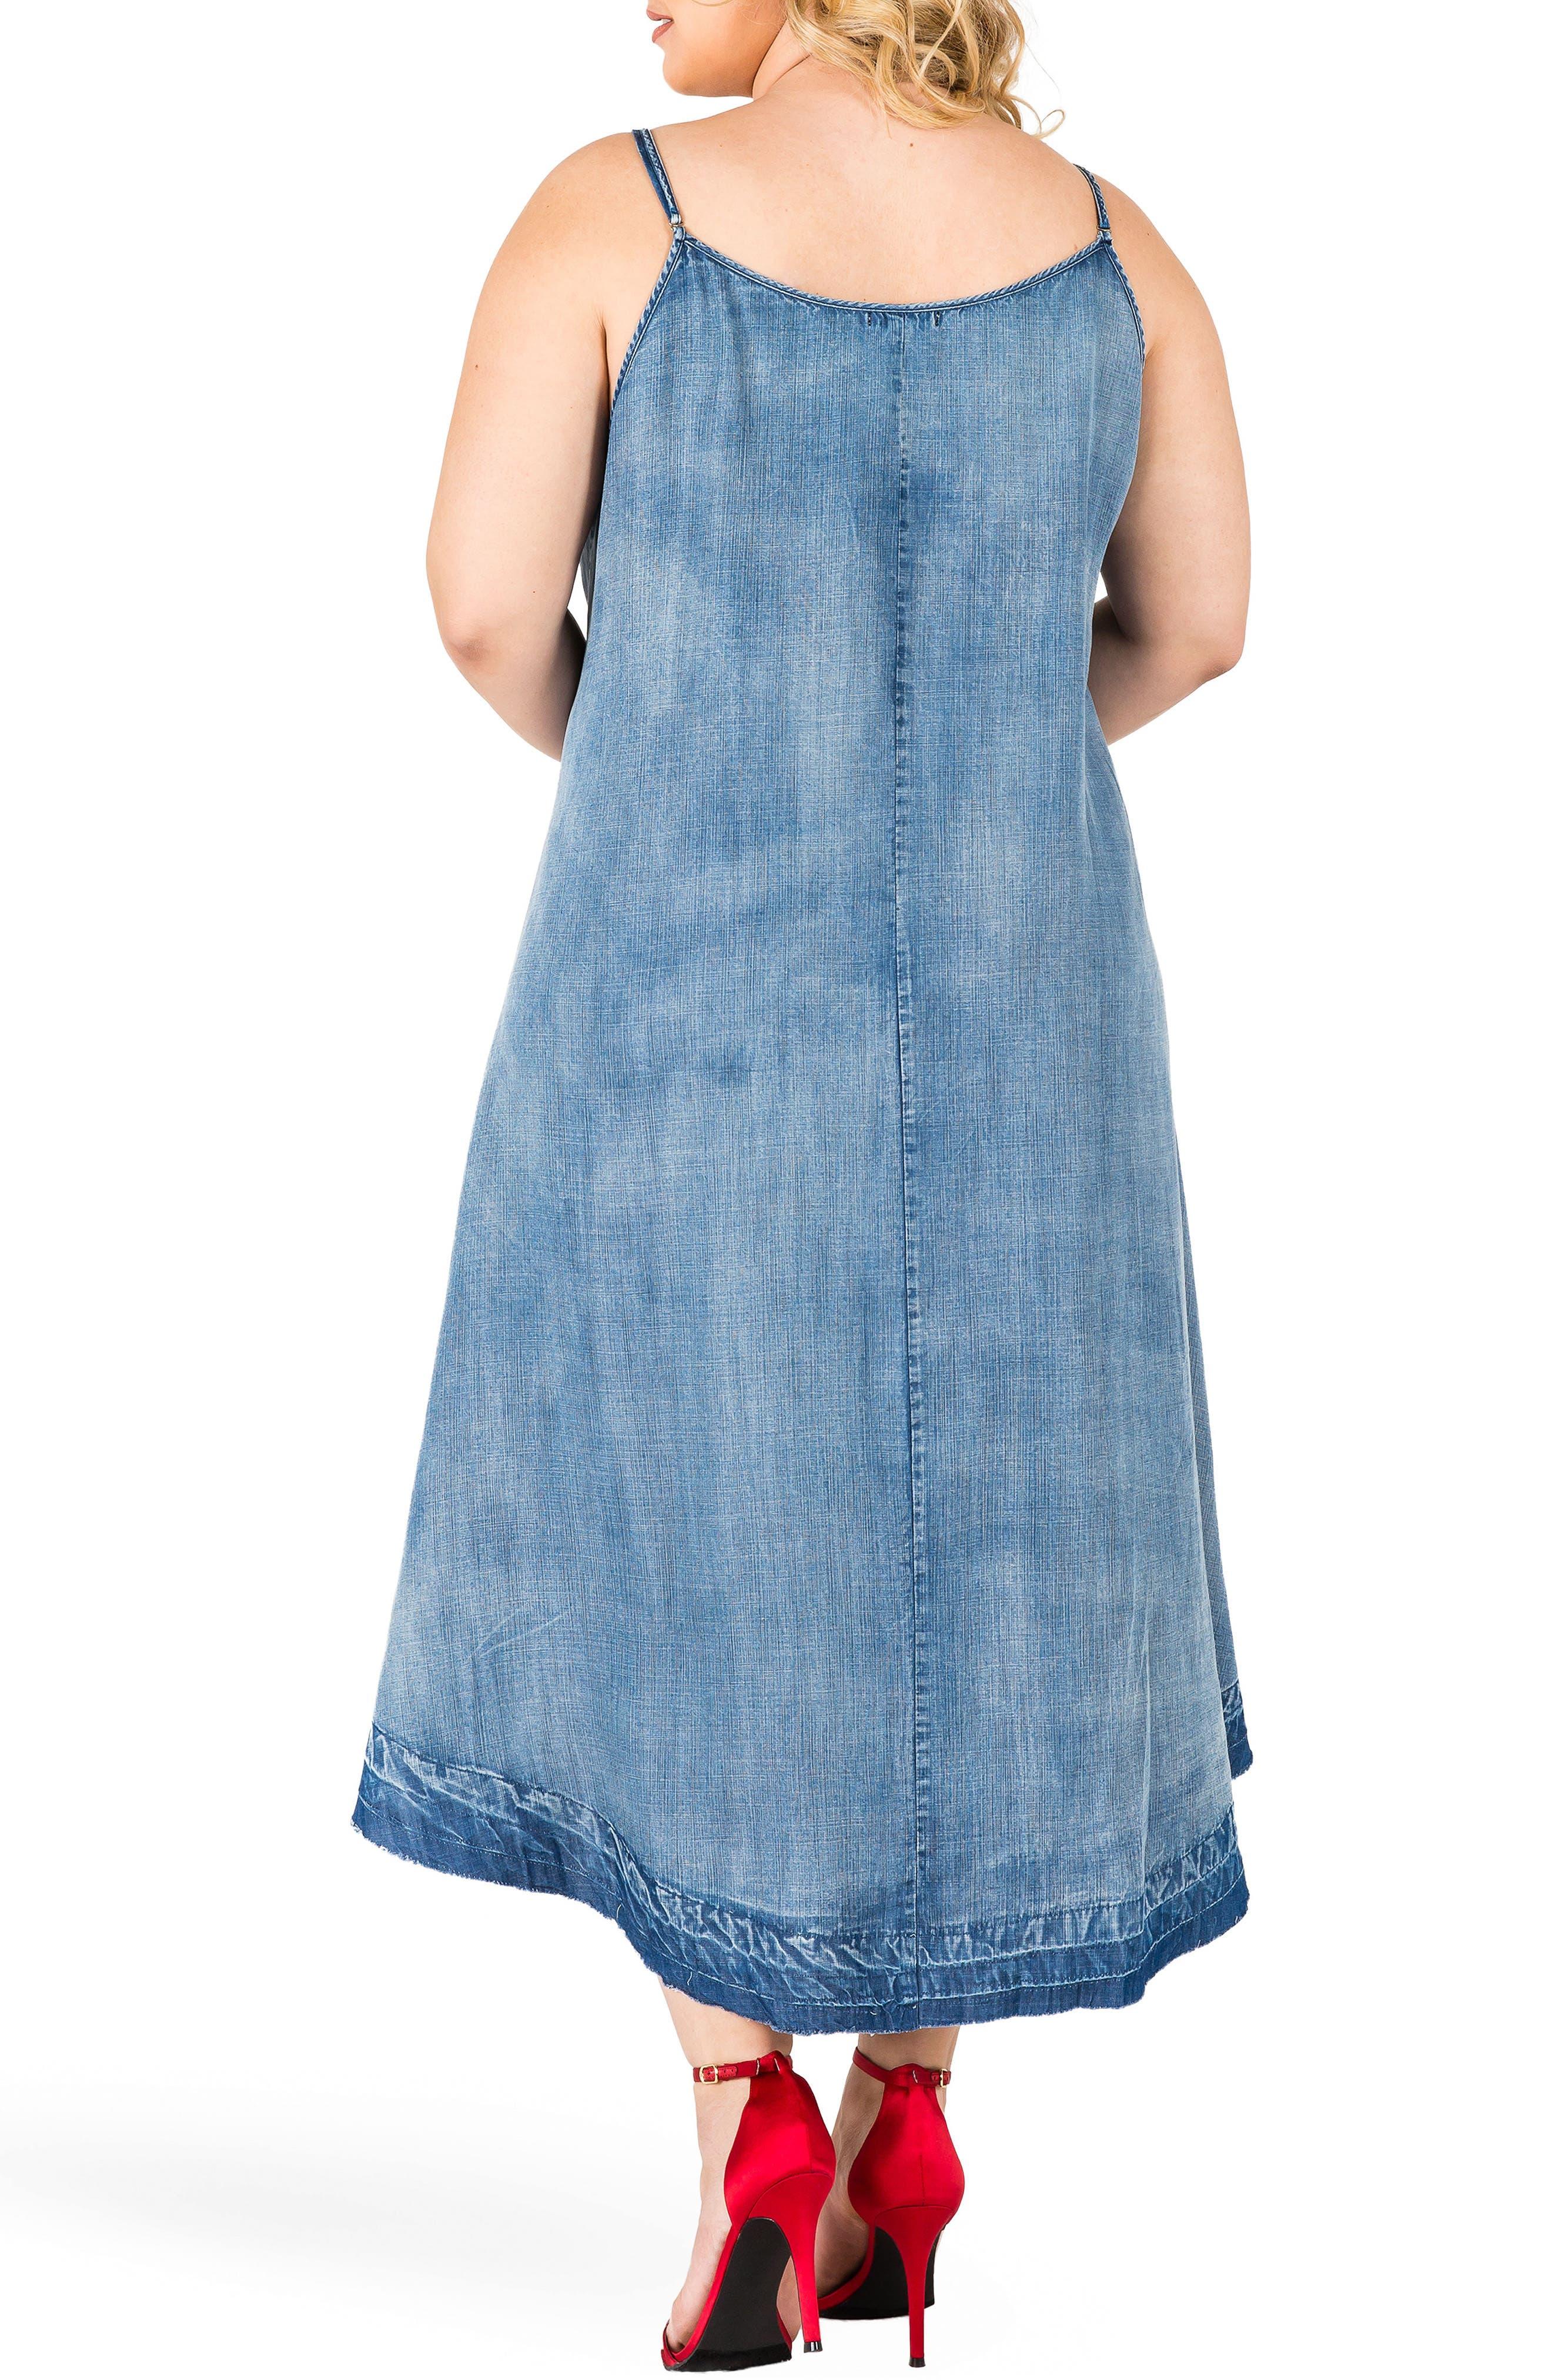 Taylor Tank Denim Midi Dress,                             Alternate thumbnail 2, color,                             Medium Blue